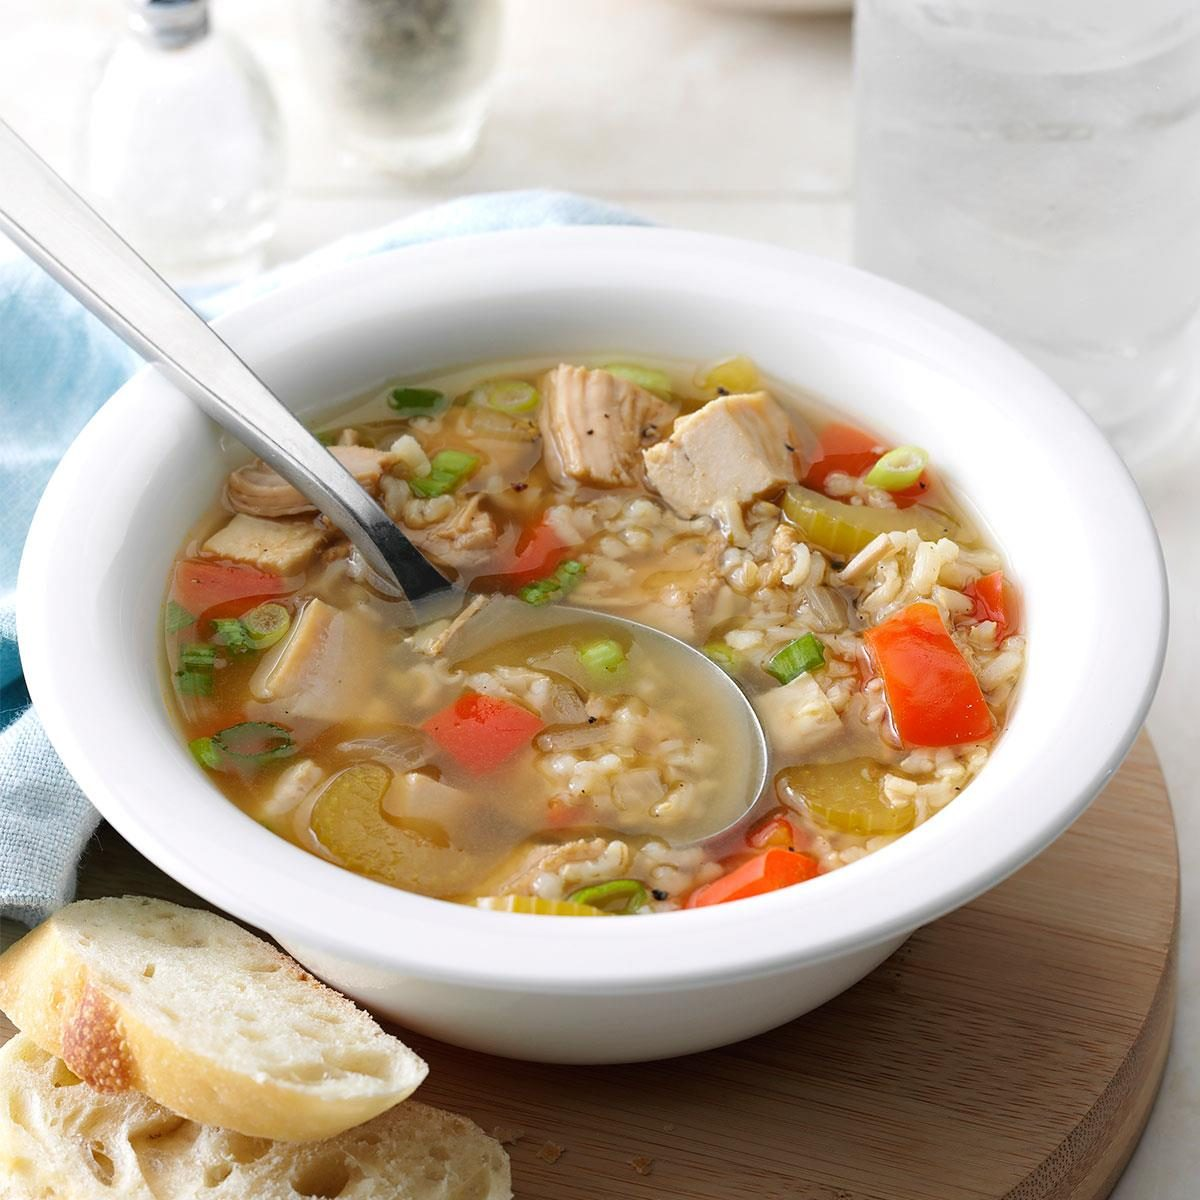 Turkey soup: cooking recipe. Turkey soup in a slow cooker 28